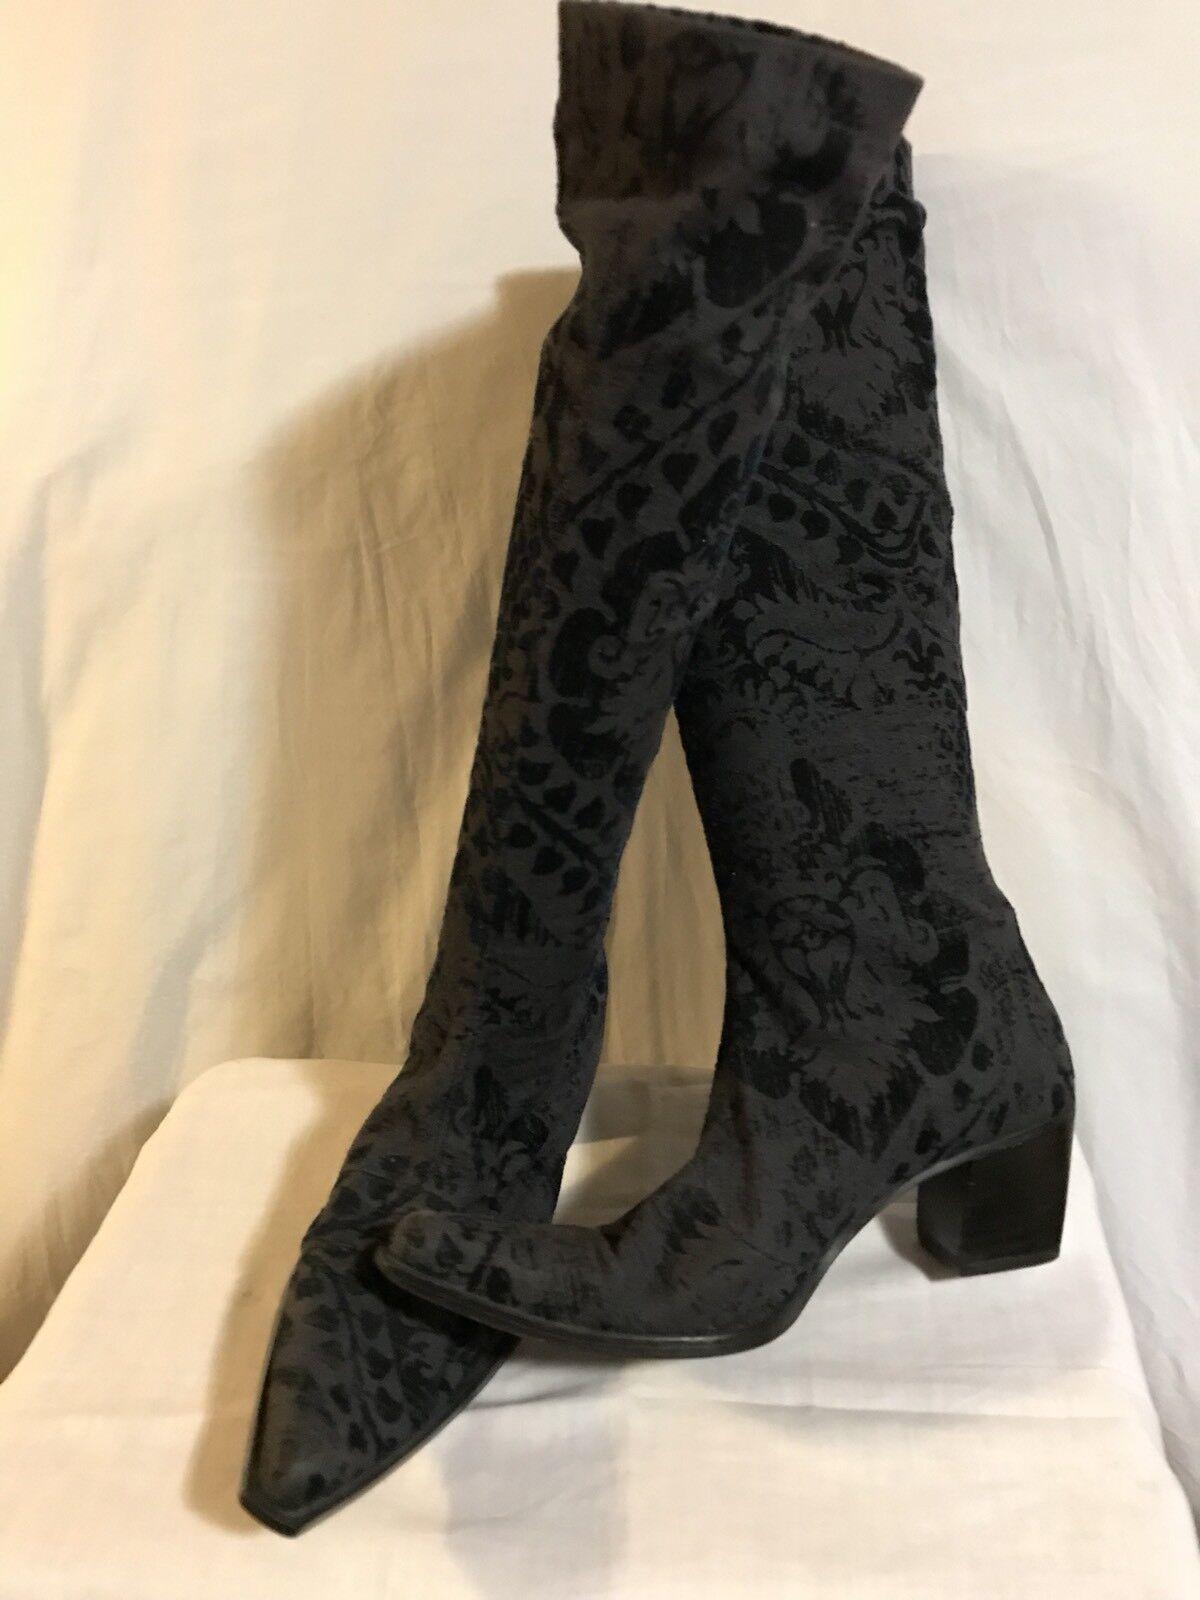 Vintage Ursula Mascaro Women's boots size 9